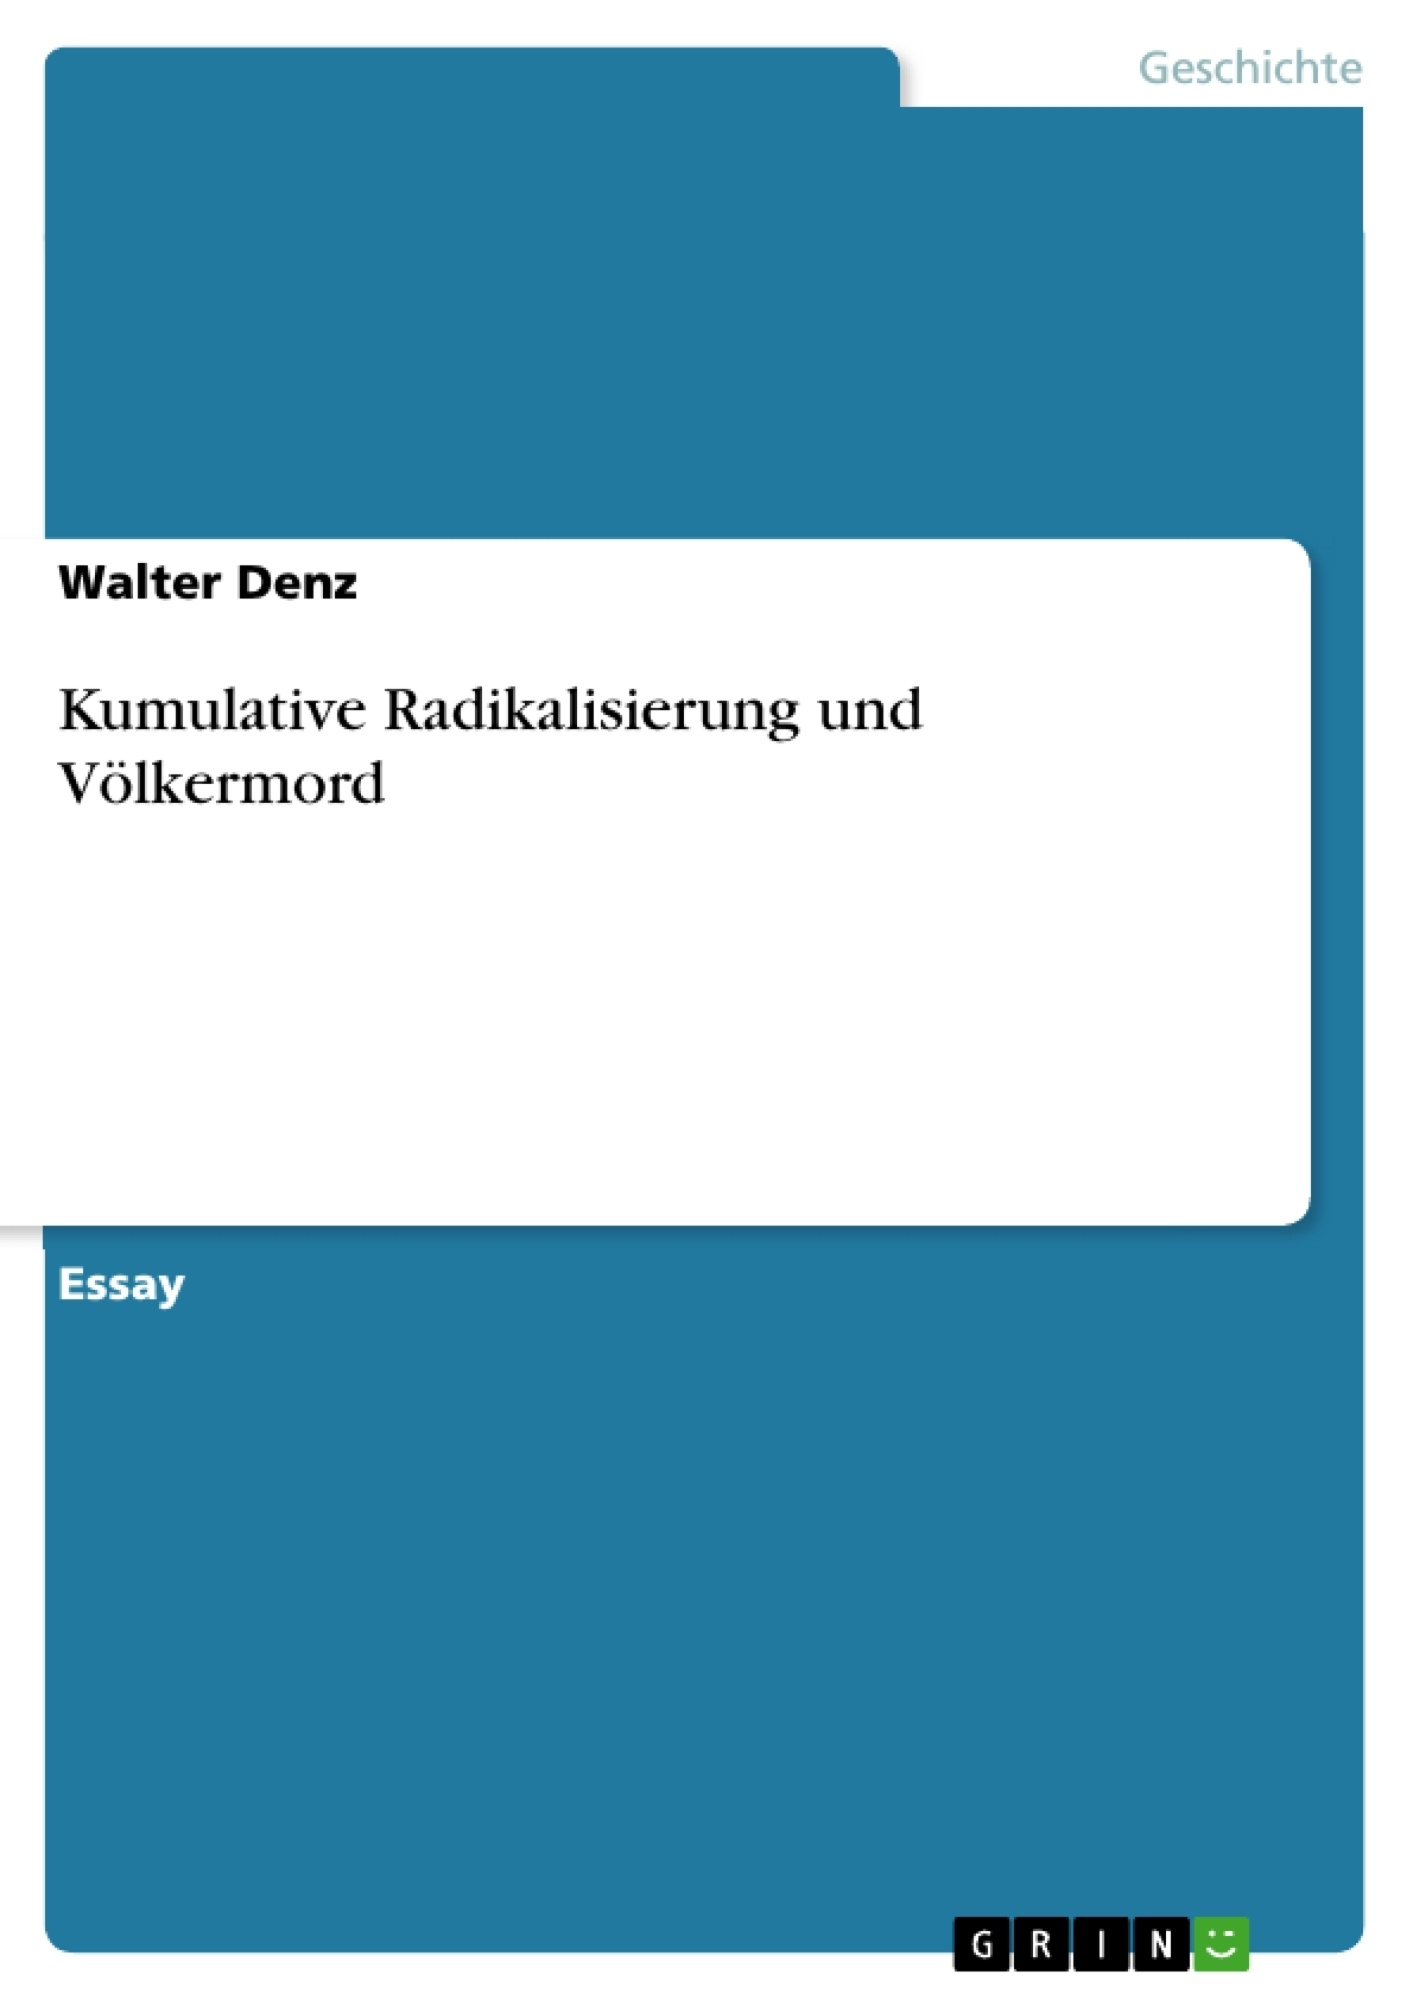 Titel: Kumulative Radikalisierung und Völkermord